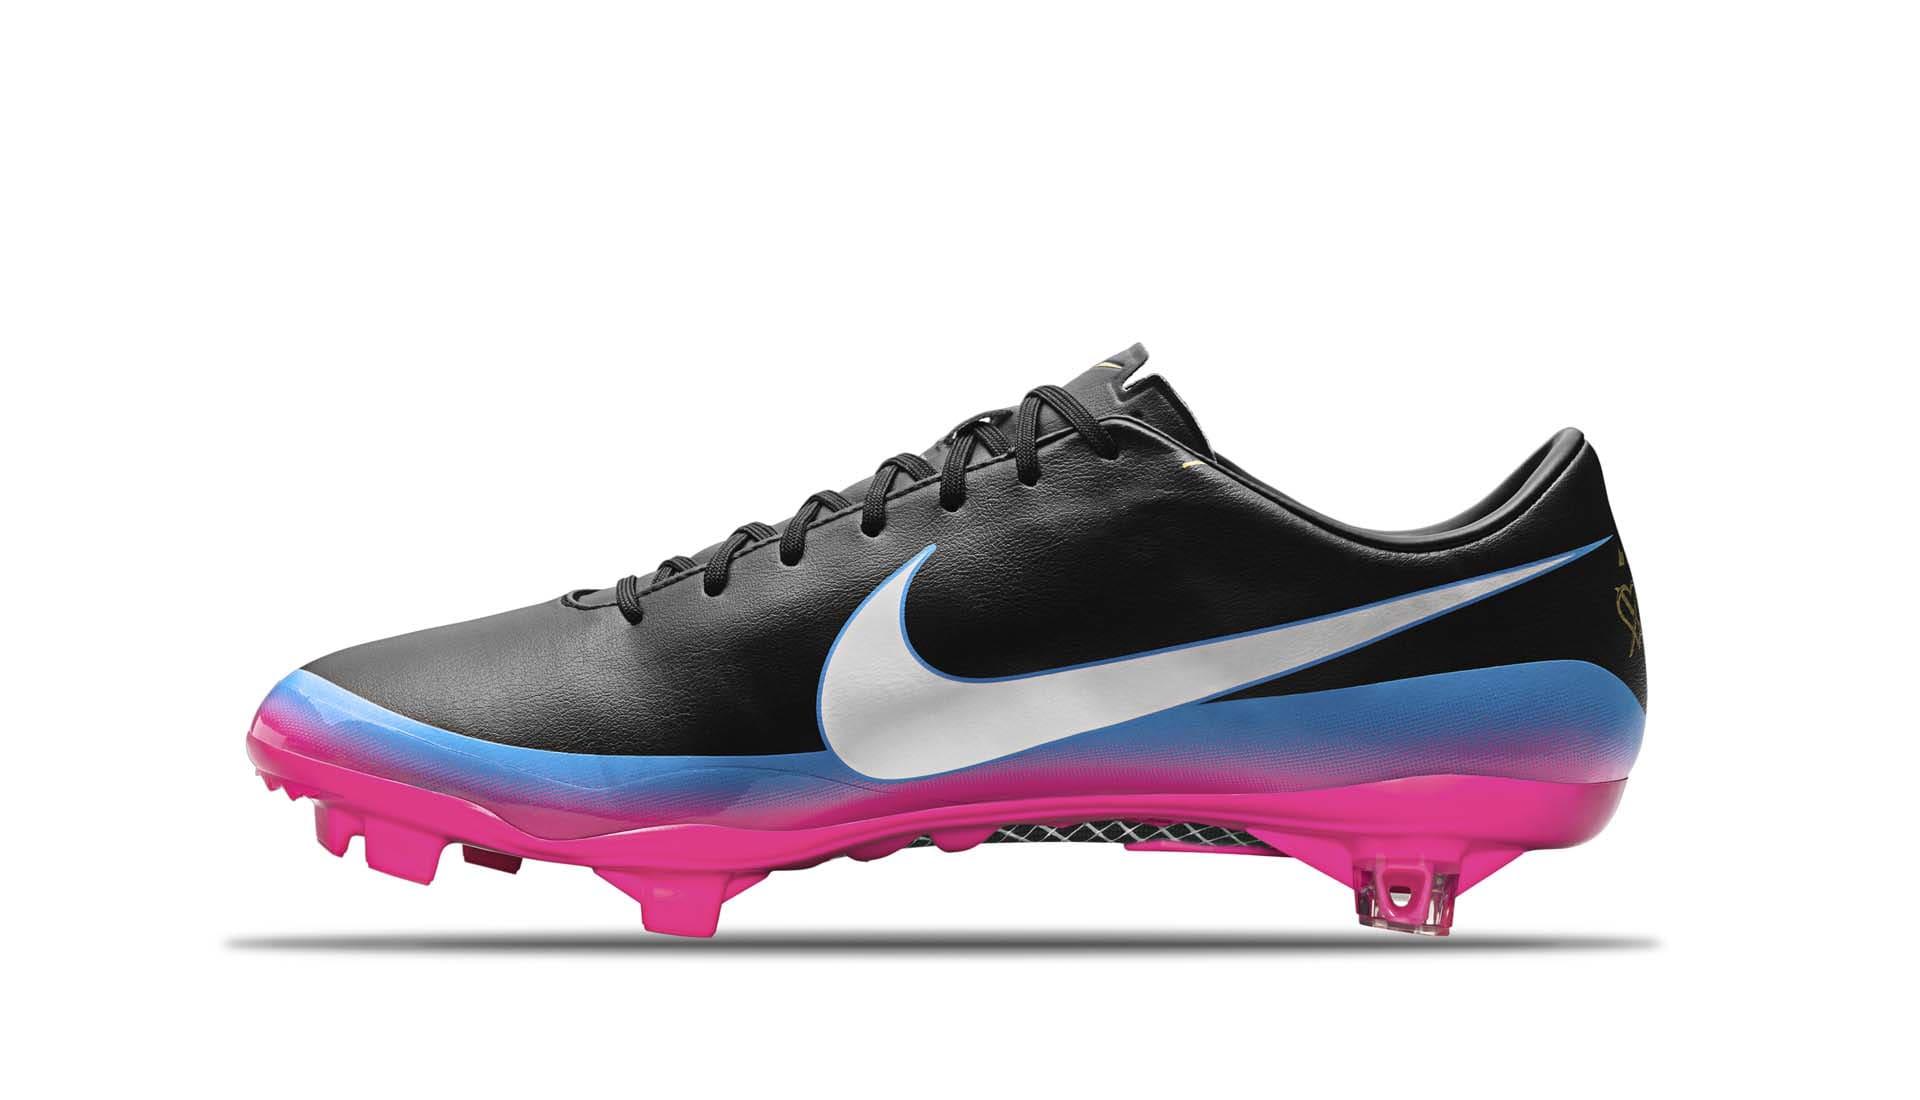 Signature CR7 Nike Mercurial